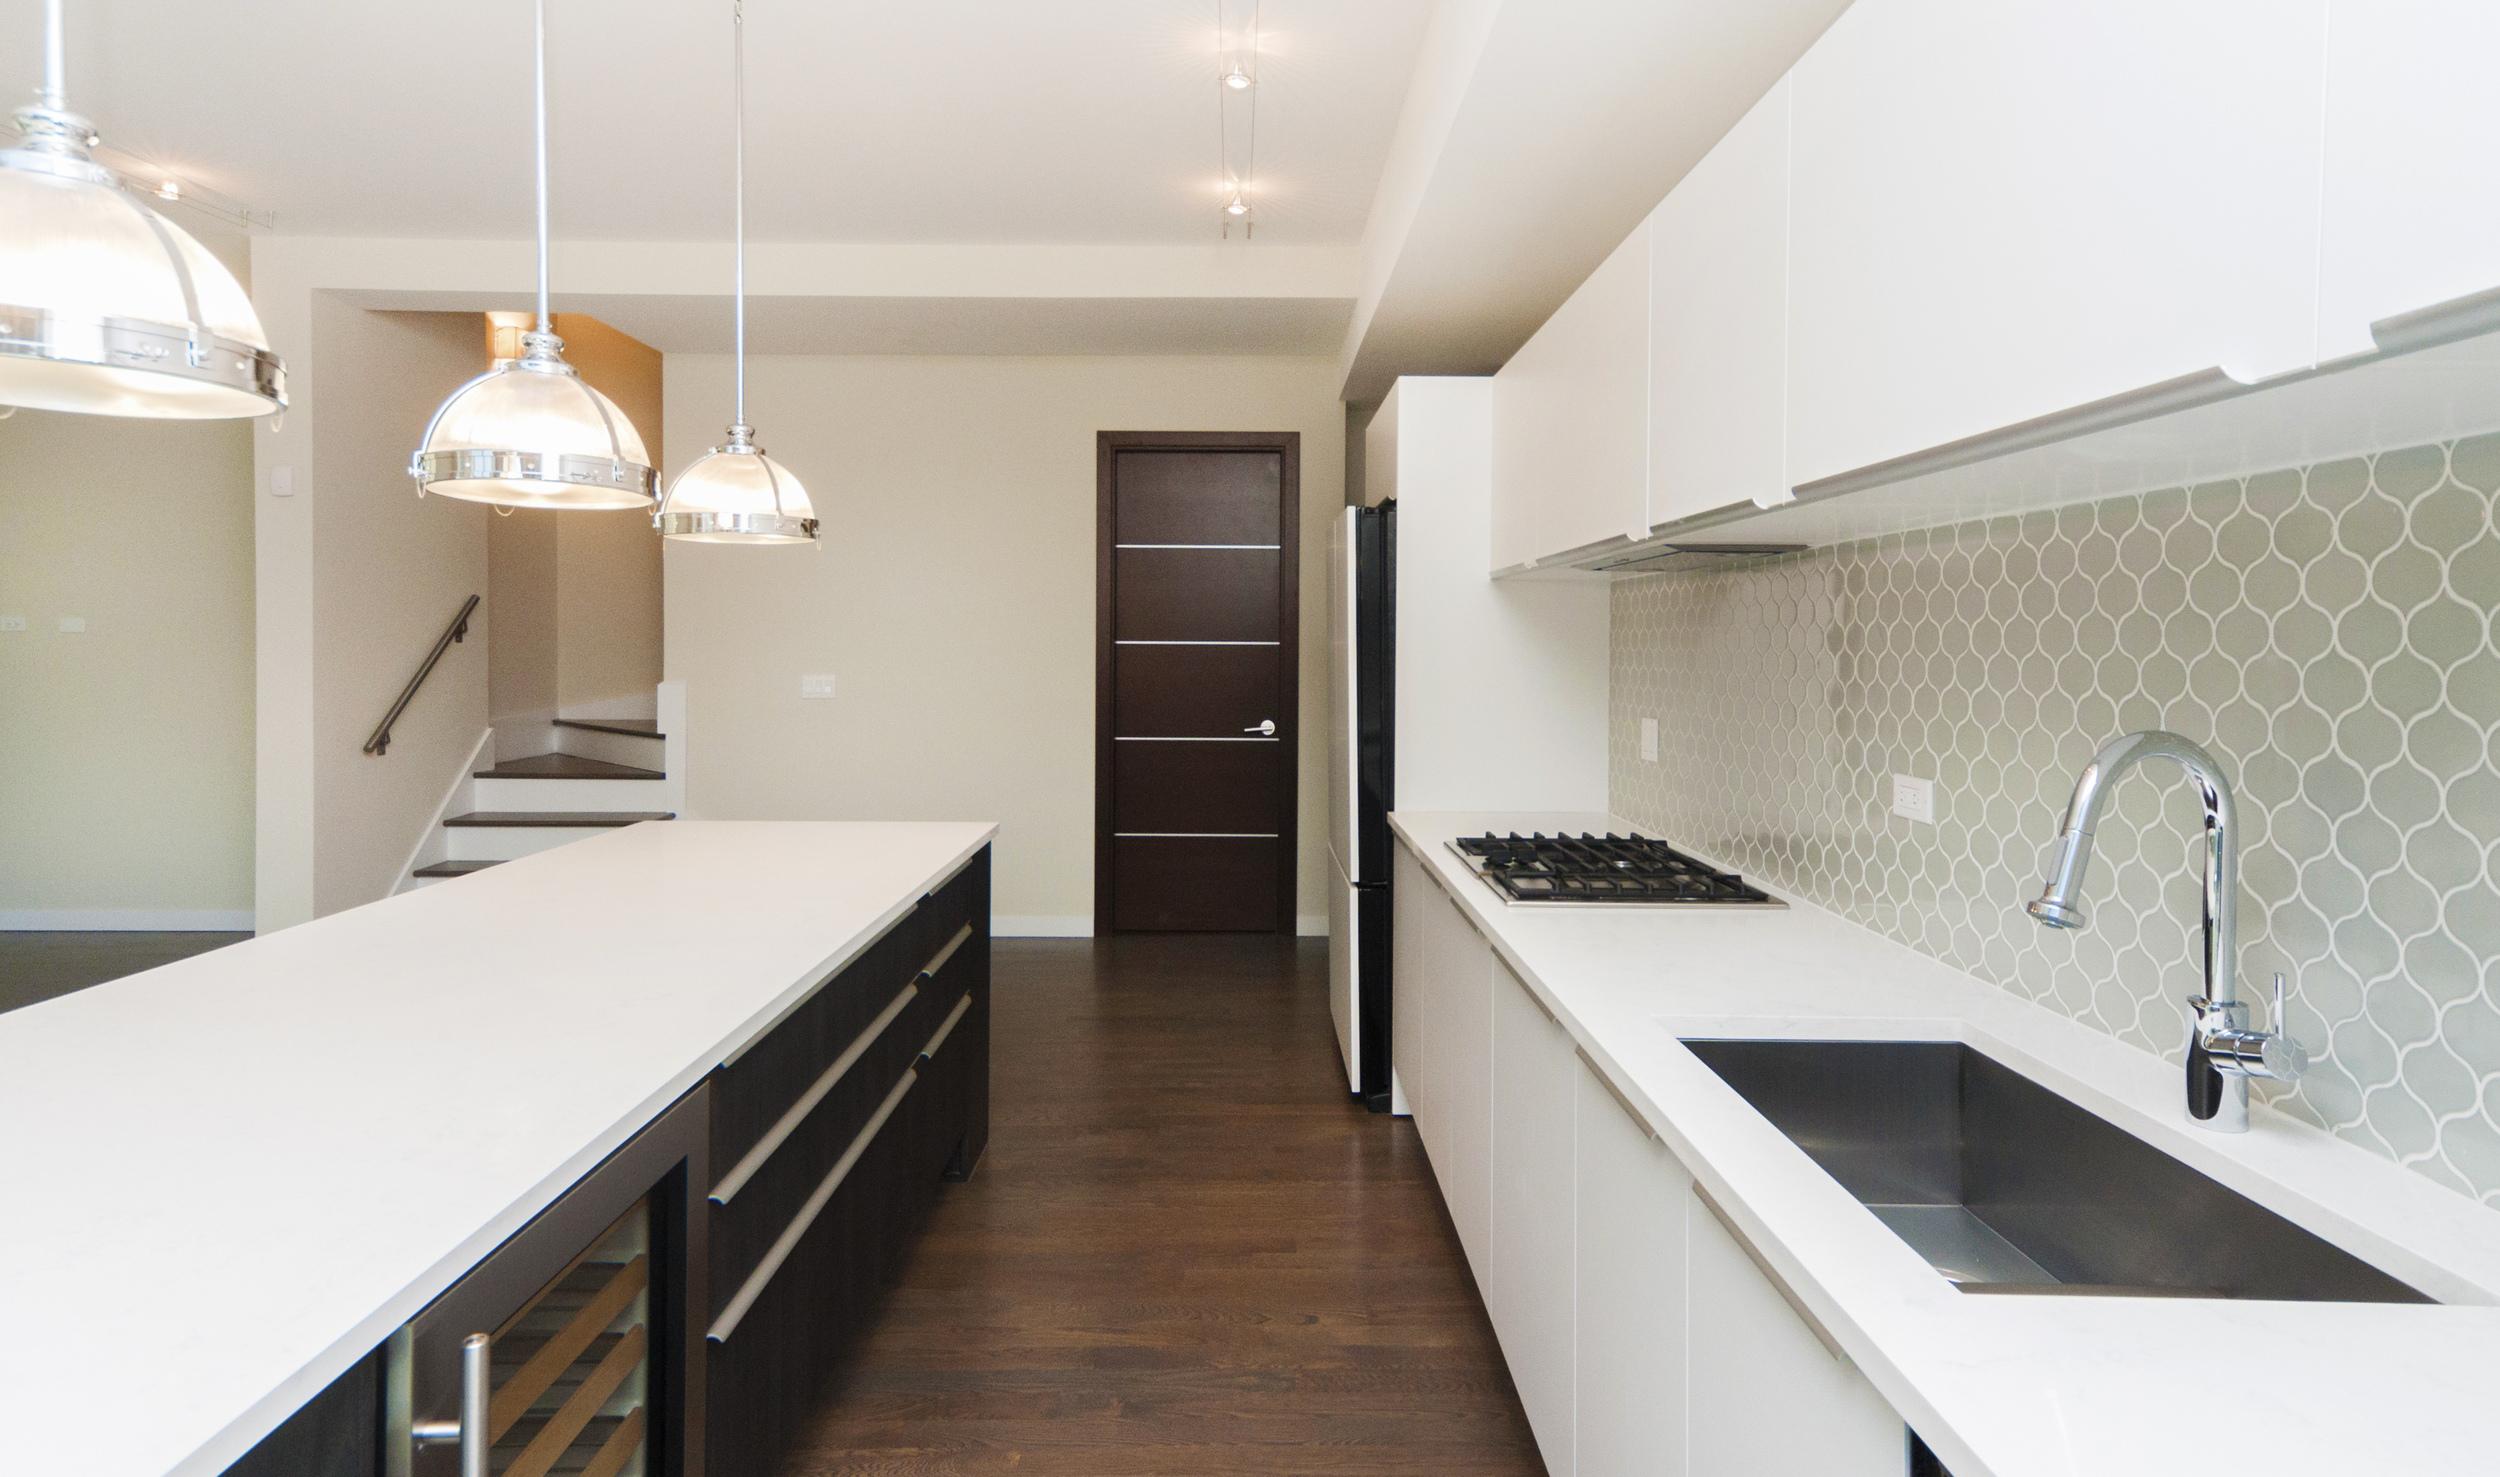 1000 North Damen Chicago Illinois Interior Kitchen TARIS Real Estate